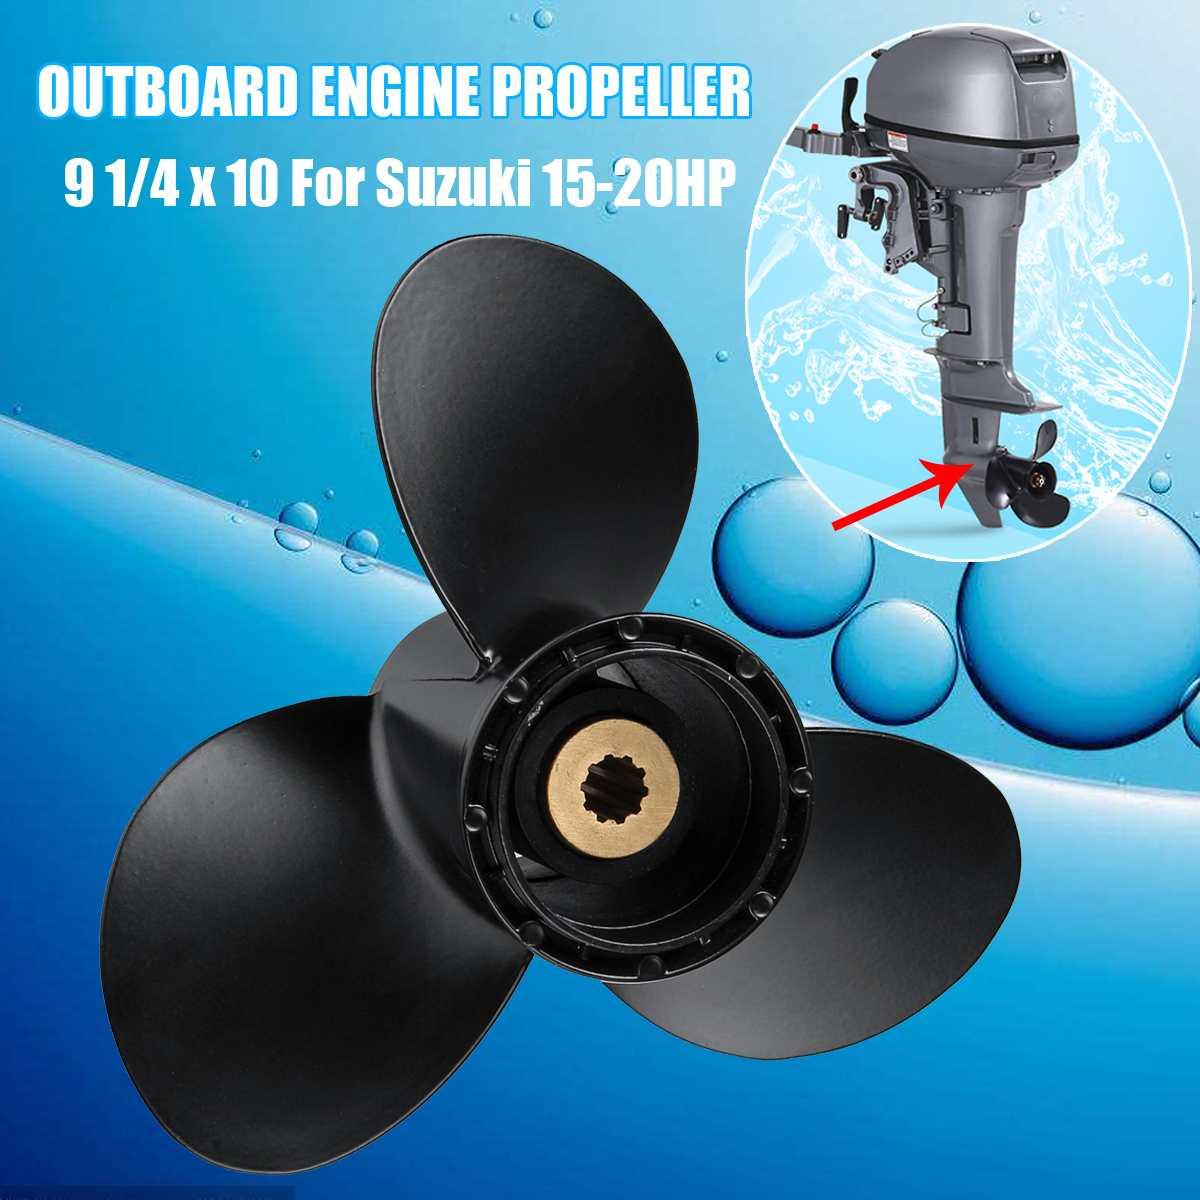 Marine Boat Engine Propeller 9 1/4 X 10 Outboard Engine Propeller For Suzuki 15-20HP